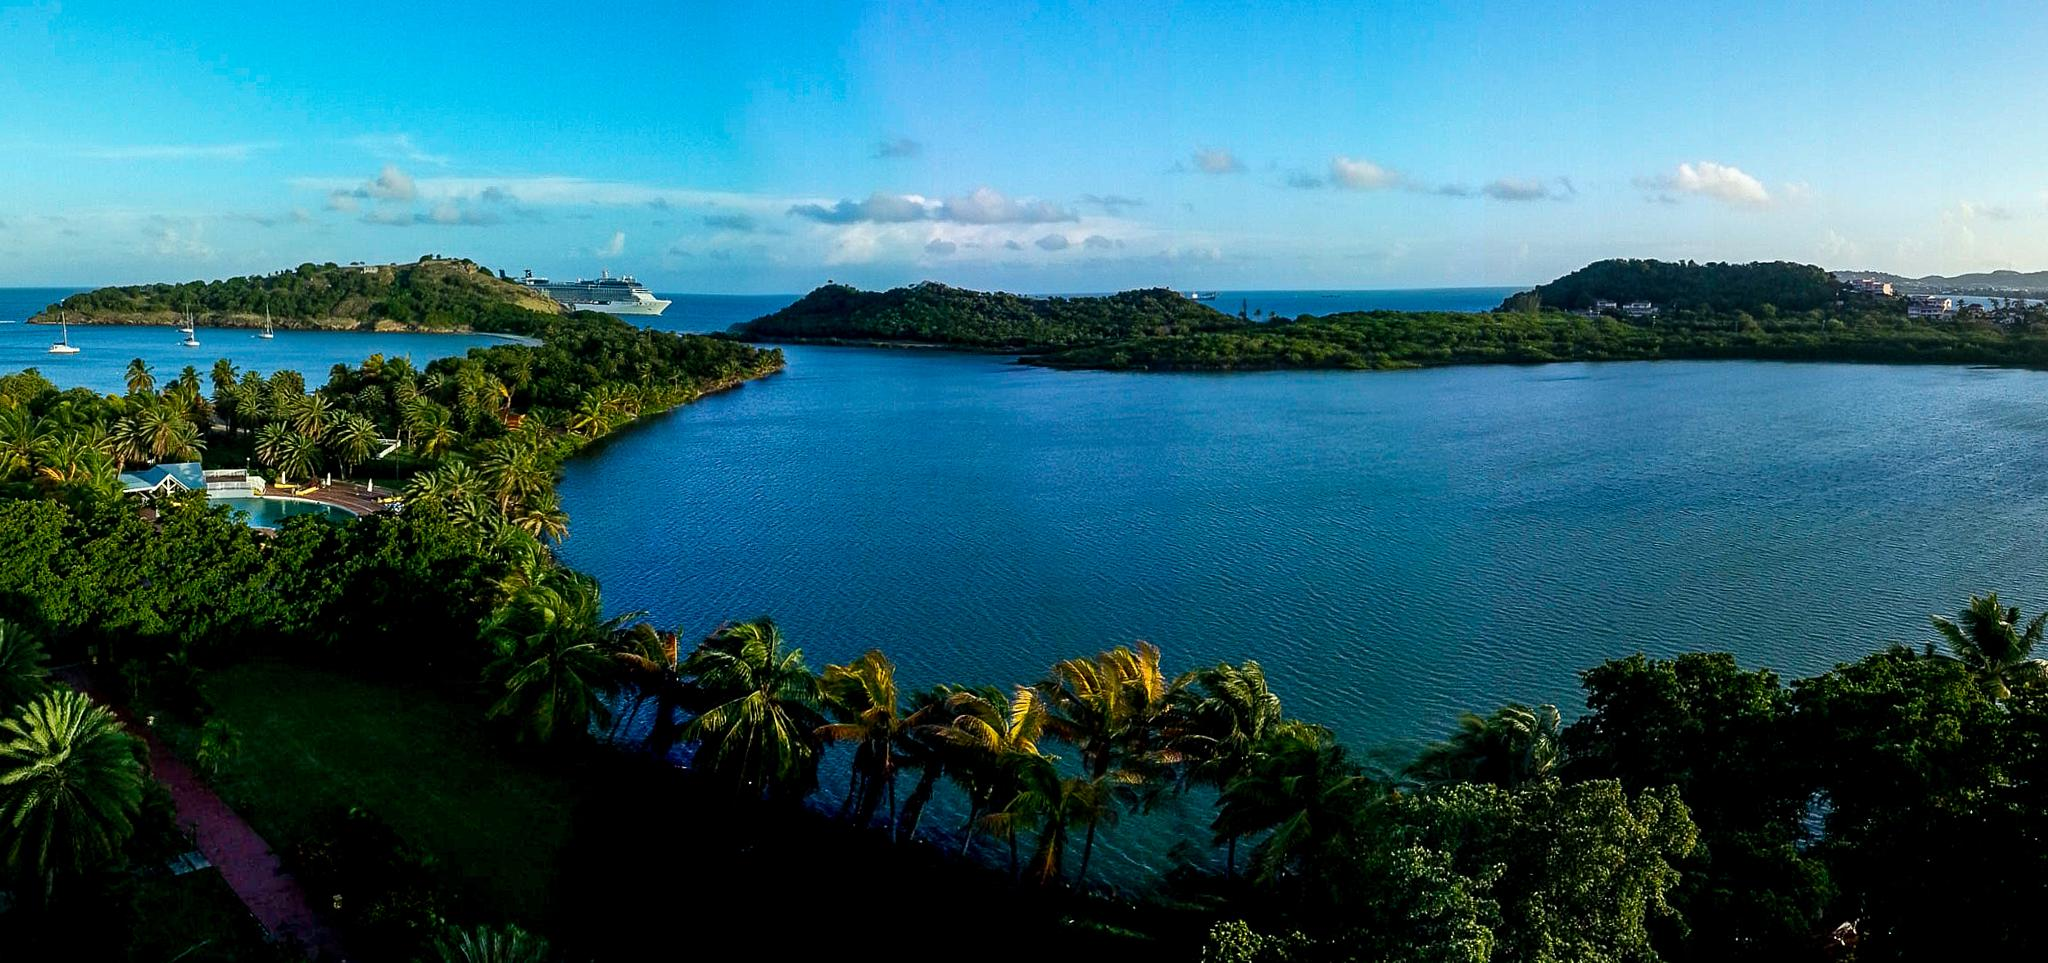 Caribbean Paradise by stephenhops